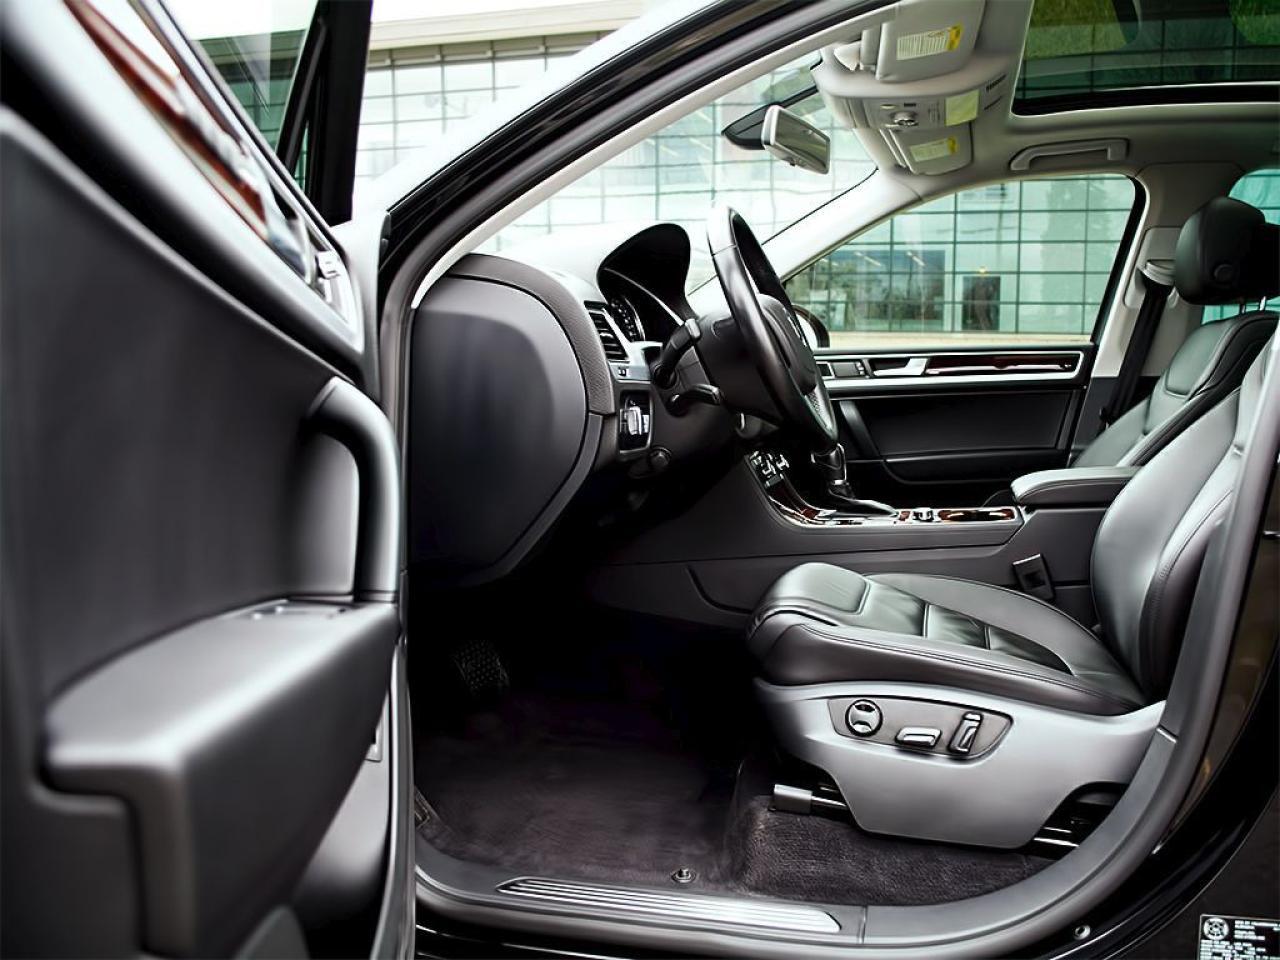 2012 Volkswagen Touareg TDI|EXECLINE|NAVI|PANOROOF|20 inch RIMS